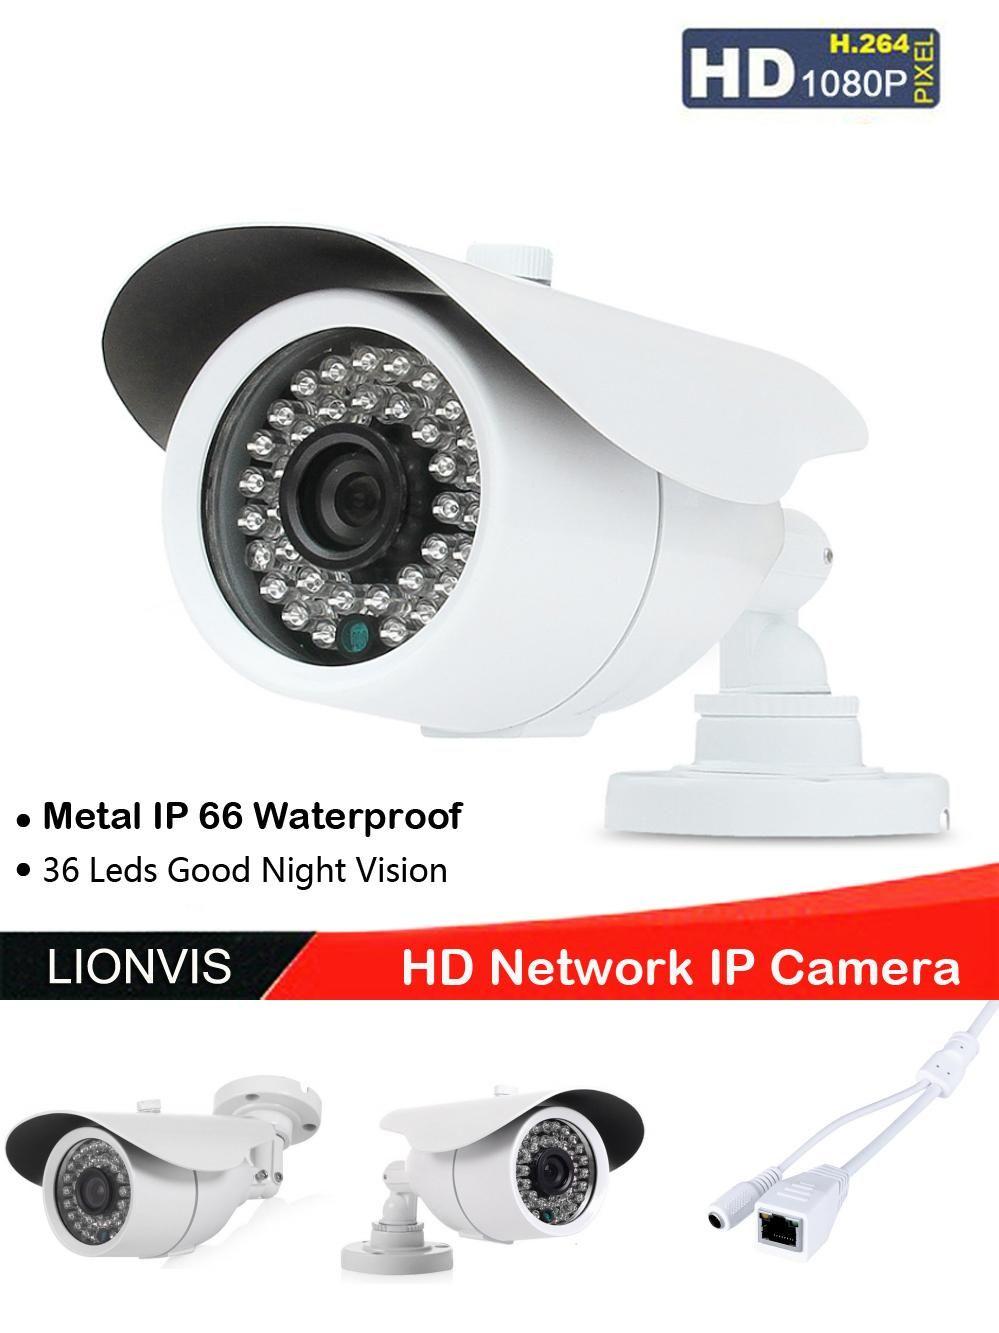 Visit to Buy] HD 1080P Network IP Camera 36 IR LED Night